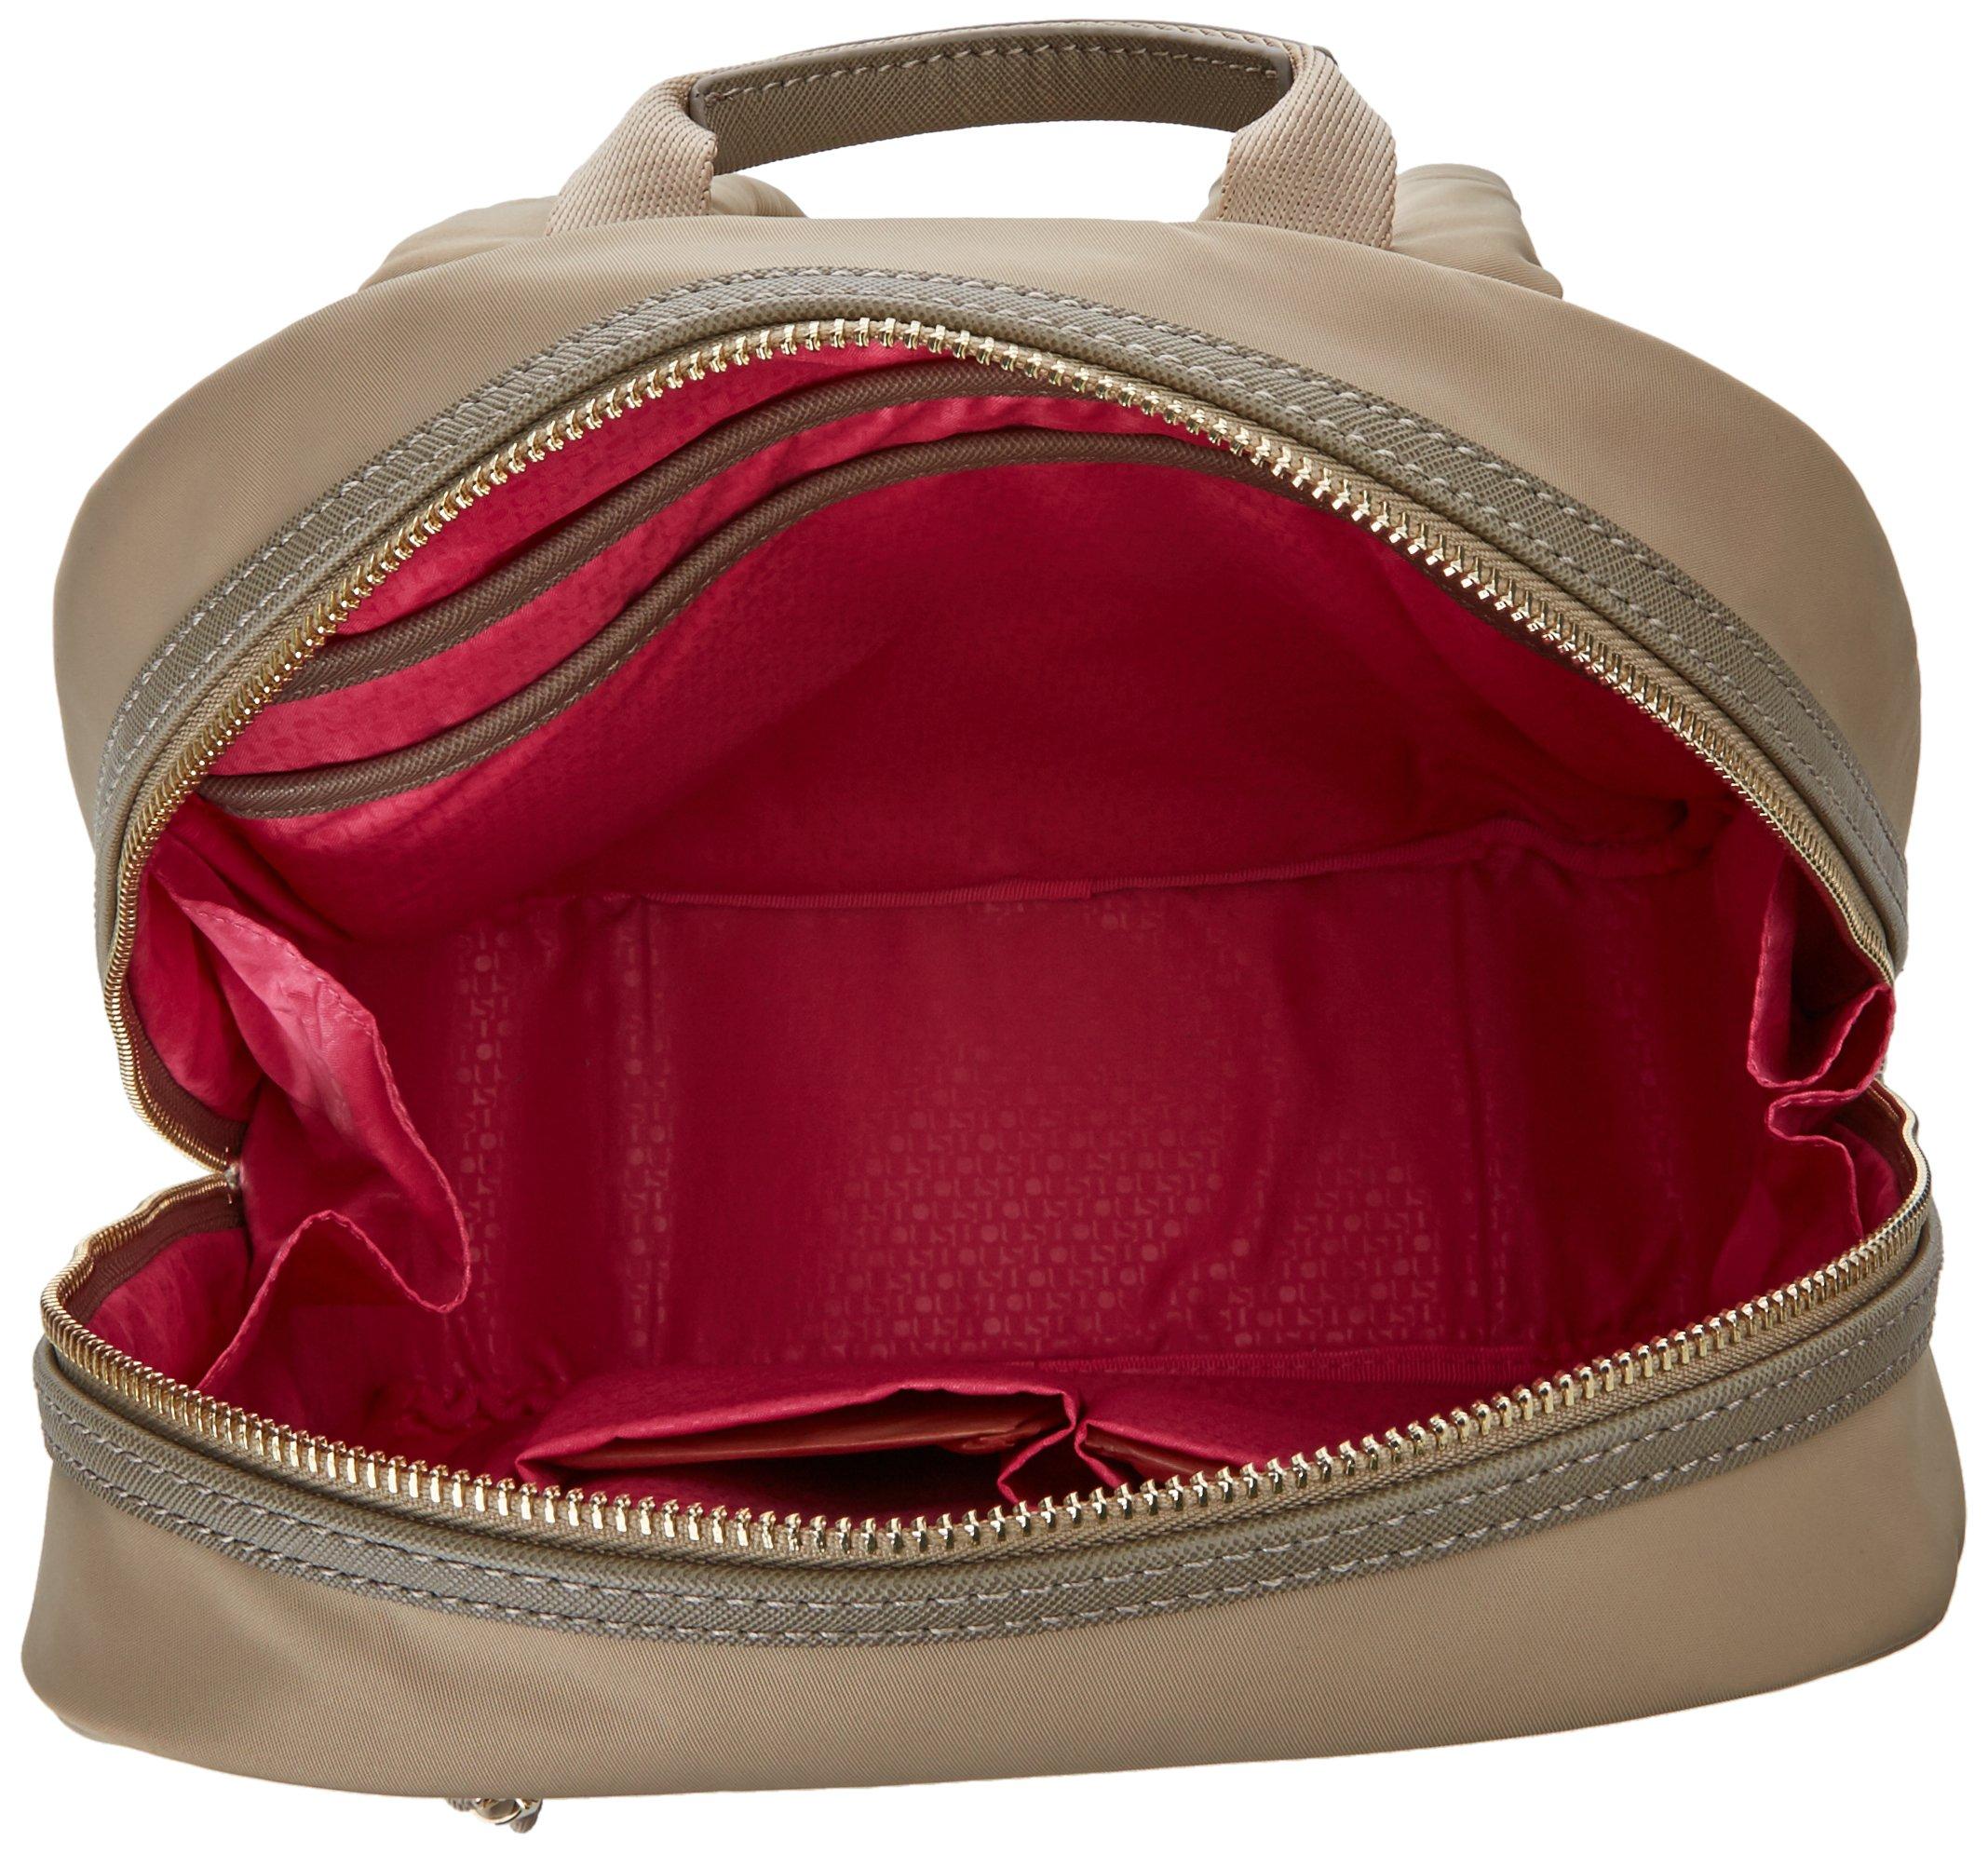 91jKTAvtfoL - Tous 695810088, Bolso mochila para Mujer, Beige (Topo), 26x33x9.5 cm (W x H x L)